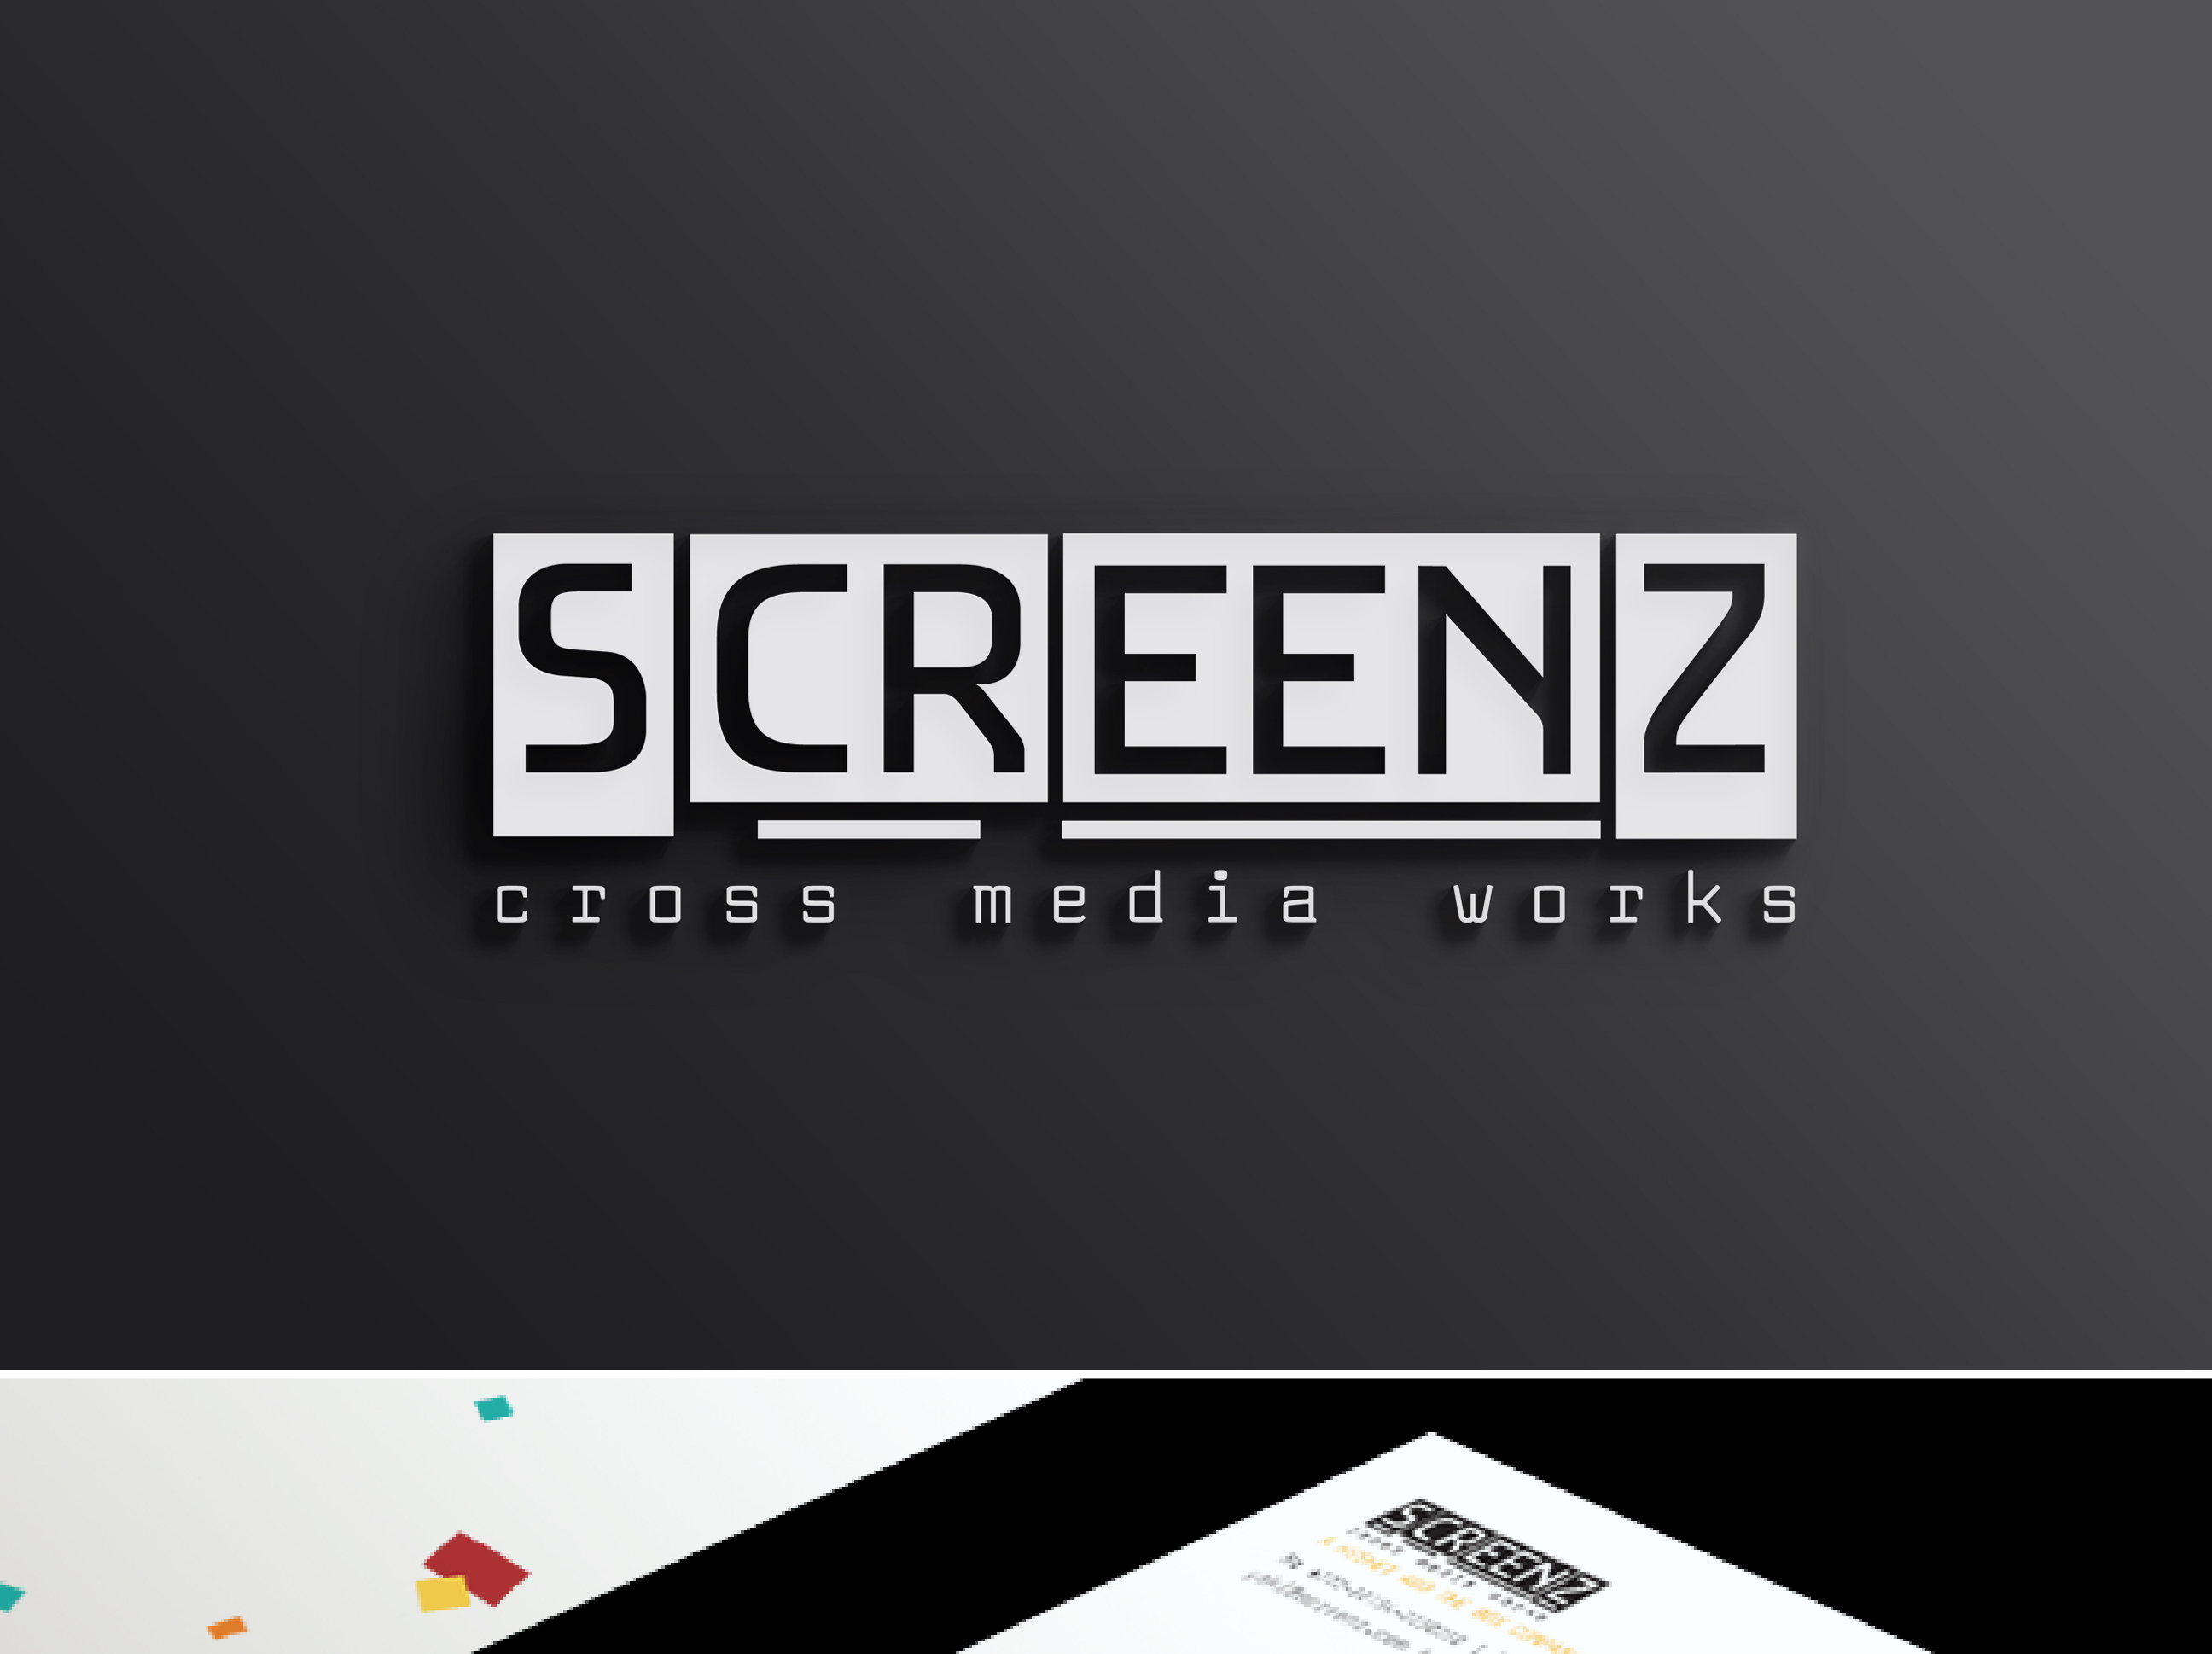 screenz 2